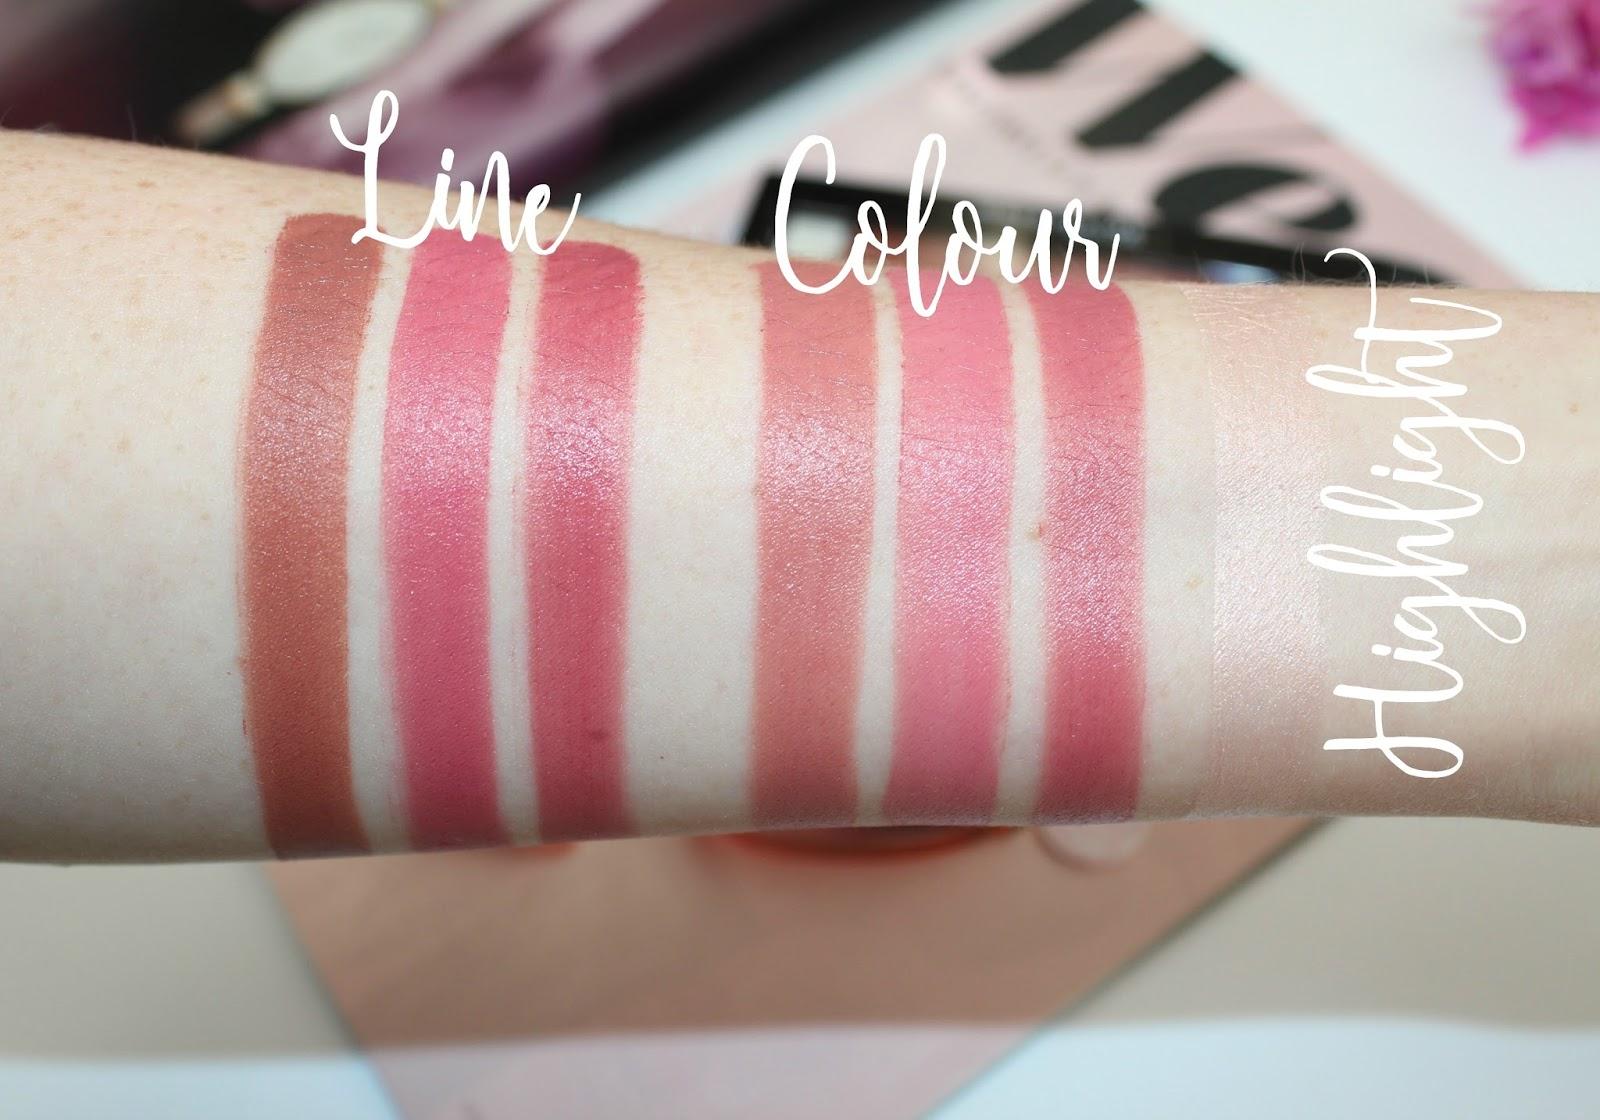 Lip Studio Color Contour Lip Palette by Maybelline #3